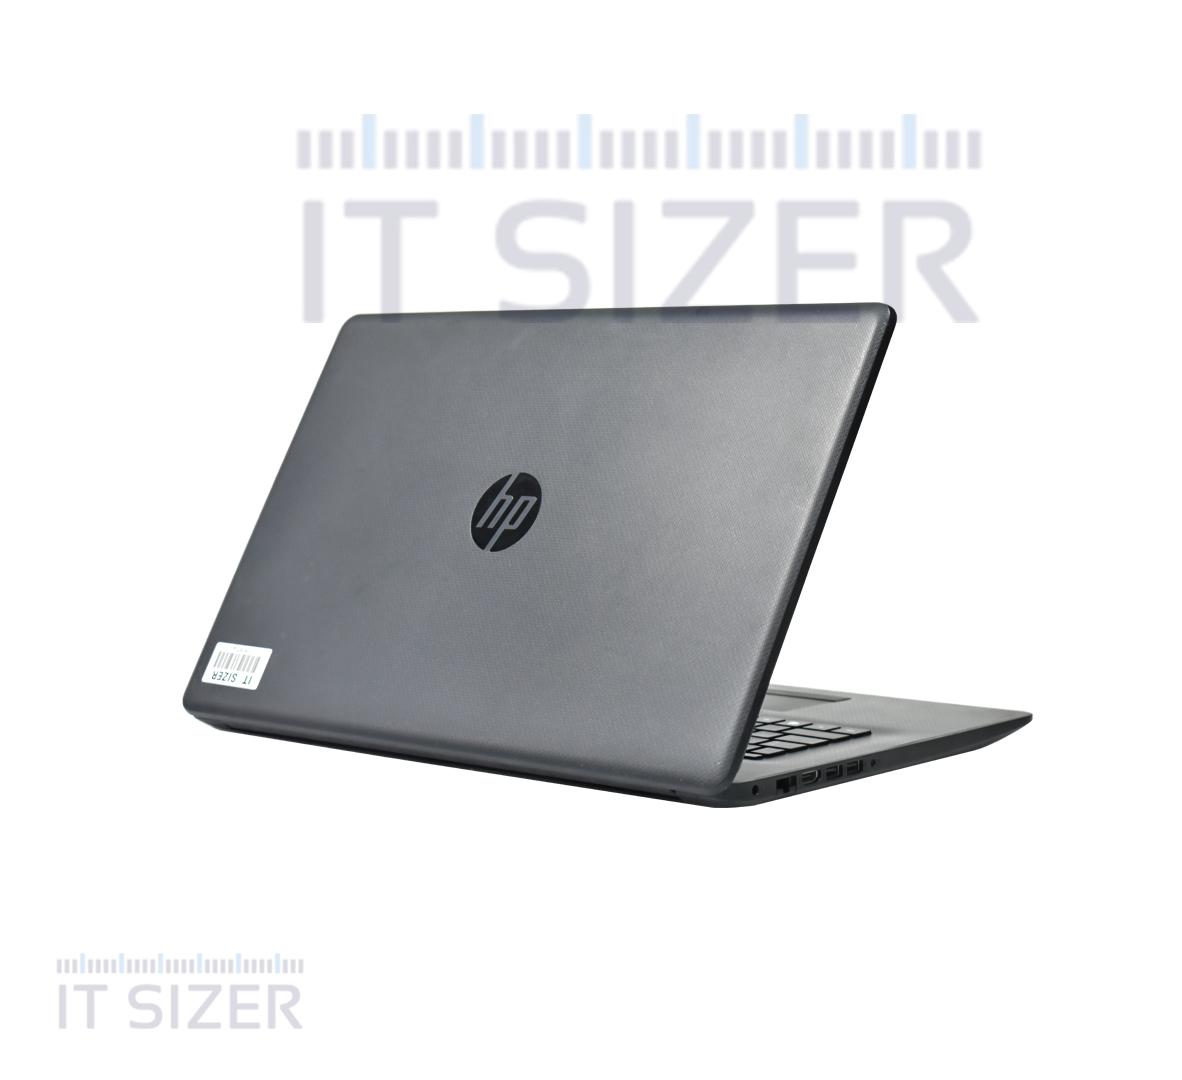 HP Pavilion 17 Notebook PC Business Laptop, Intel Core i5-1035G1 CPU, 8GB DDR4 SODIMM RAM, 256GB SSD M2, 17 inch Display, Windows 10 Pro (Renewed)